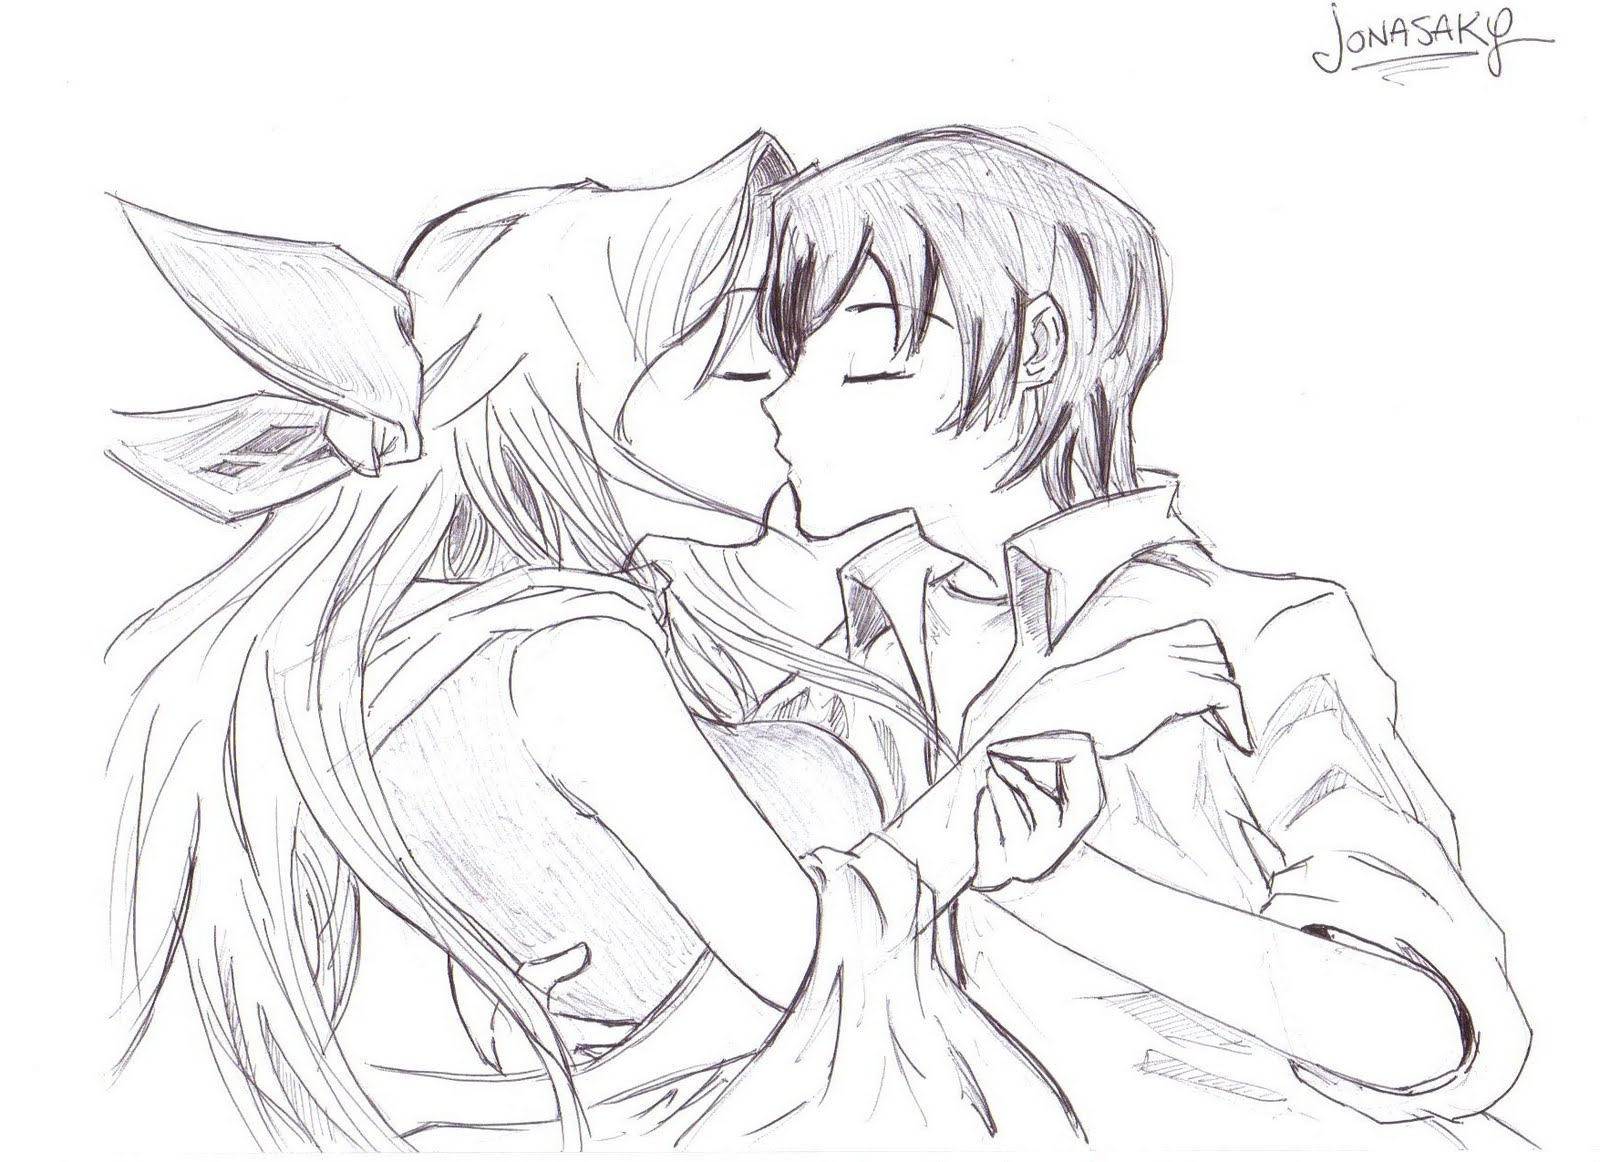 Beso en mil años